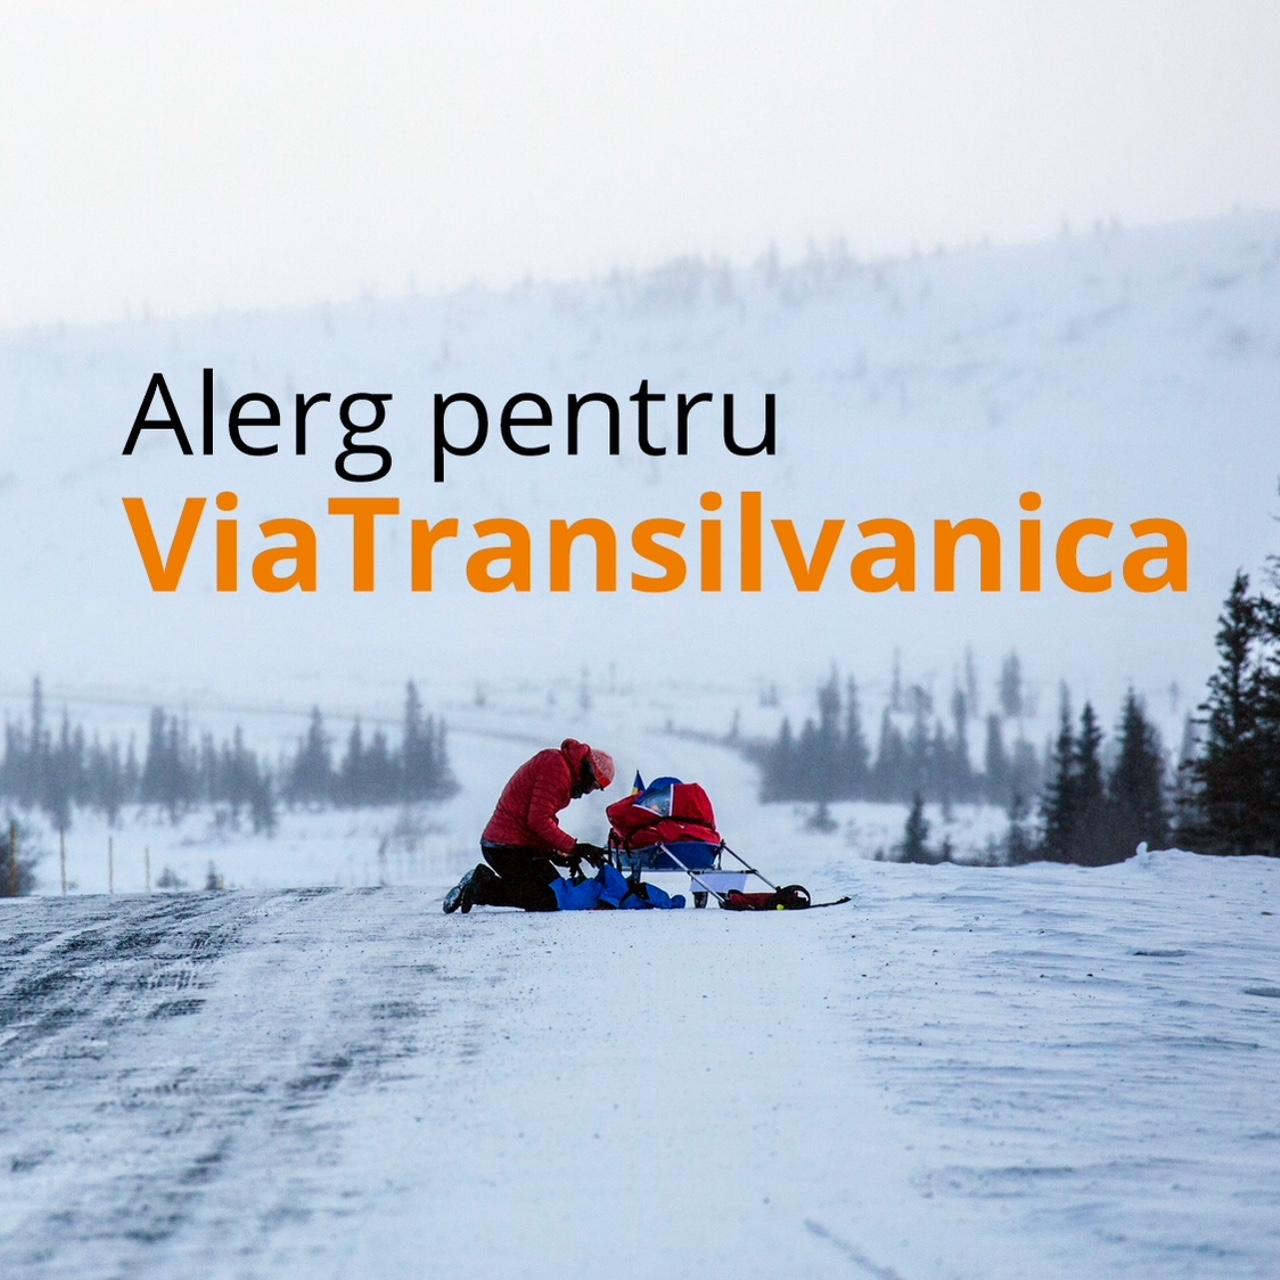 Tasuleasa Social Via Transilvanica Scoala de Mers pe Munte Yukon Arctic Ultra